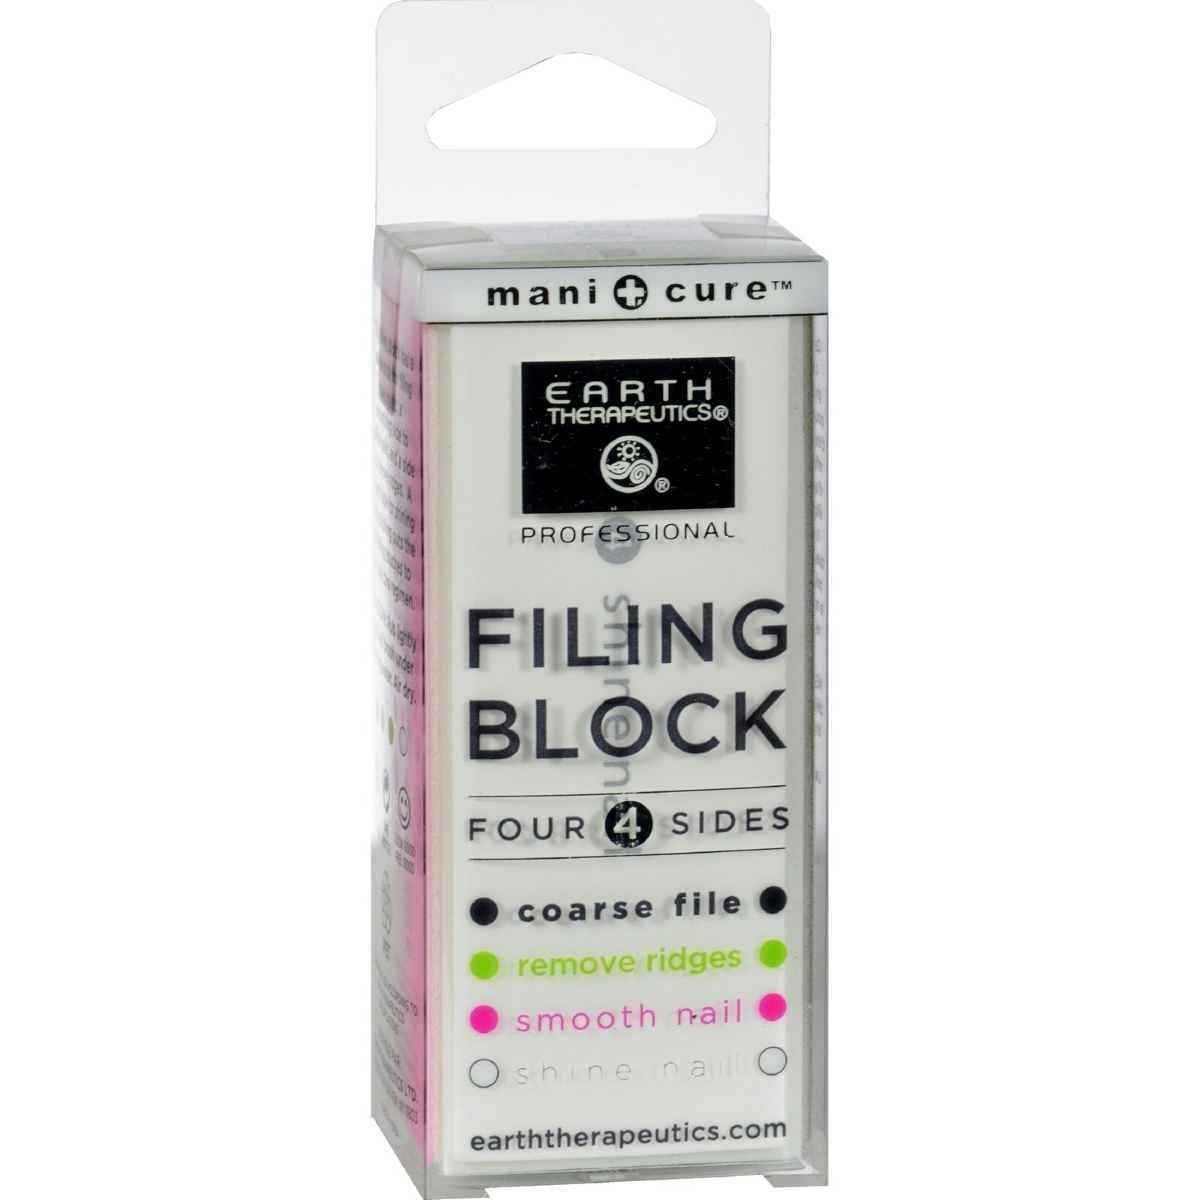 Earth Therapeutics Filing Block - 1 File ET7107